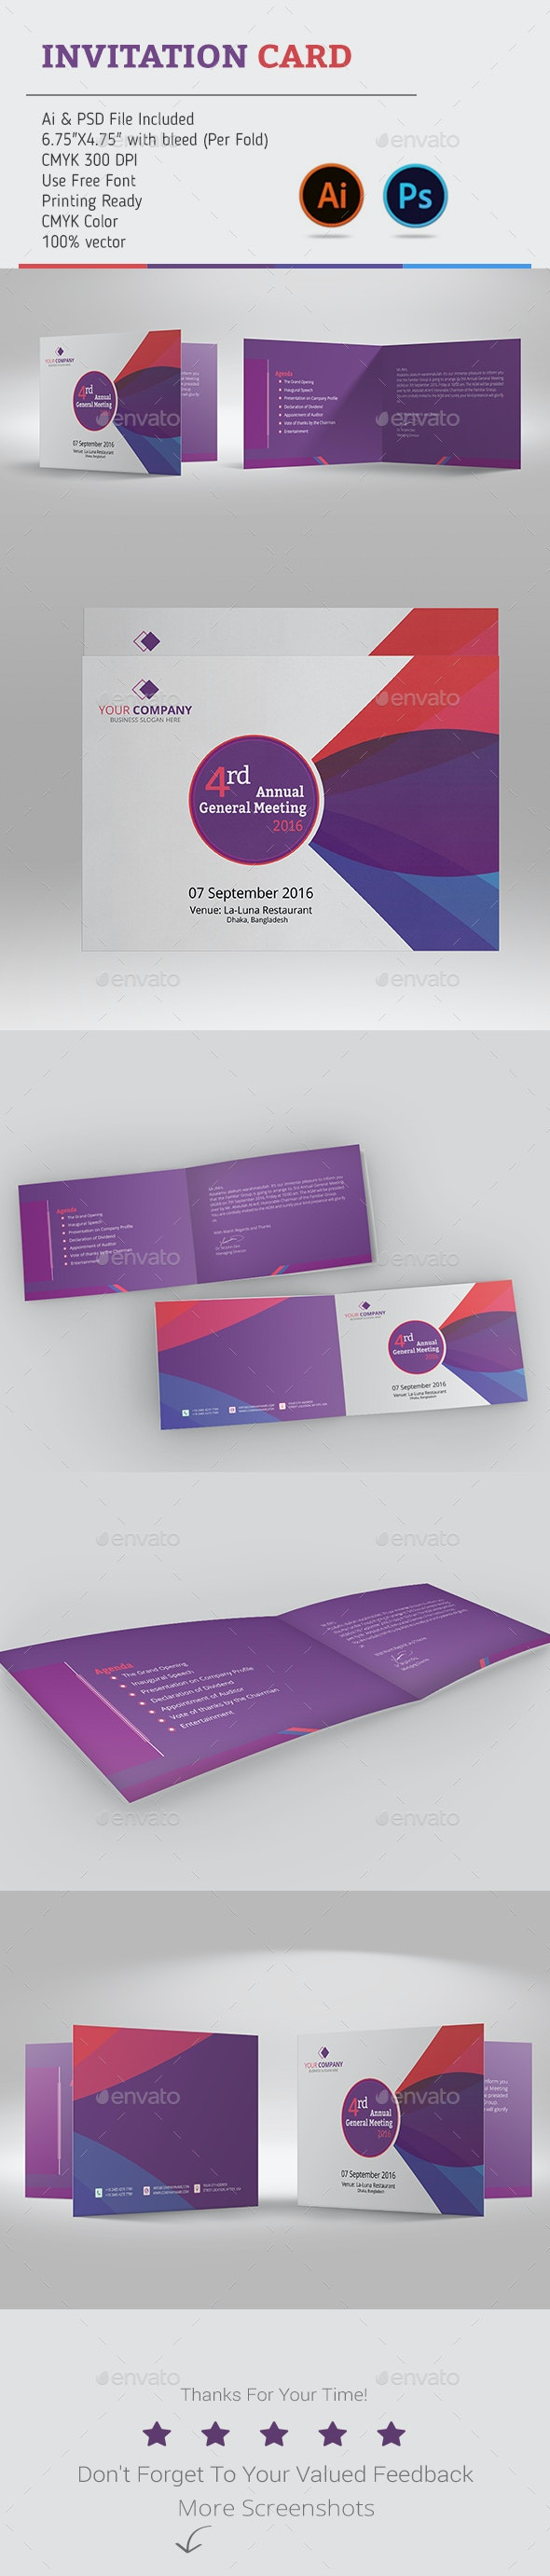 Corporate Annual Meeting Invitation Card - Invitations Cards & Invites